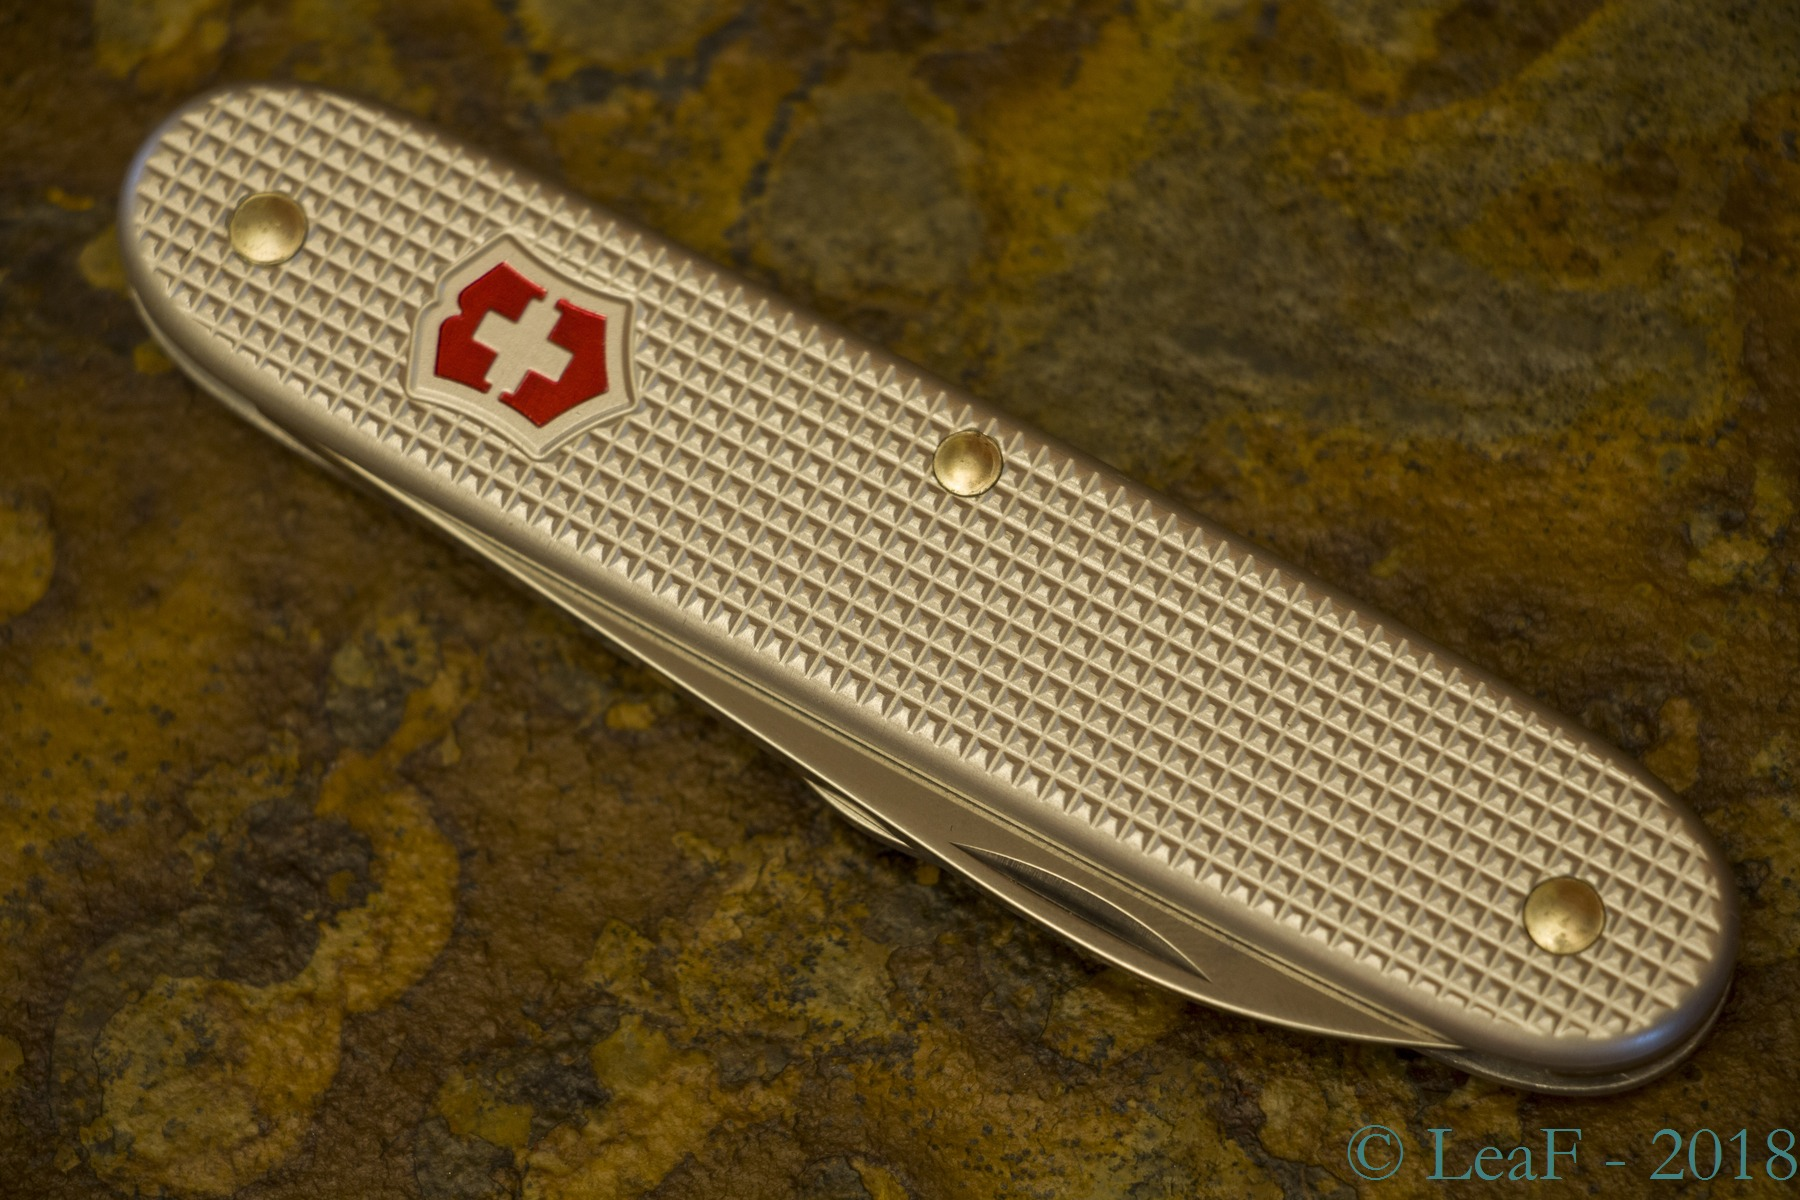 551 Apprentice Alox Leaf S Victorinox Knives Collection